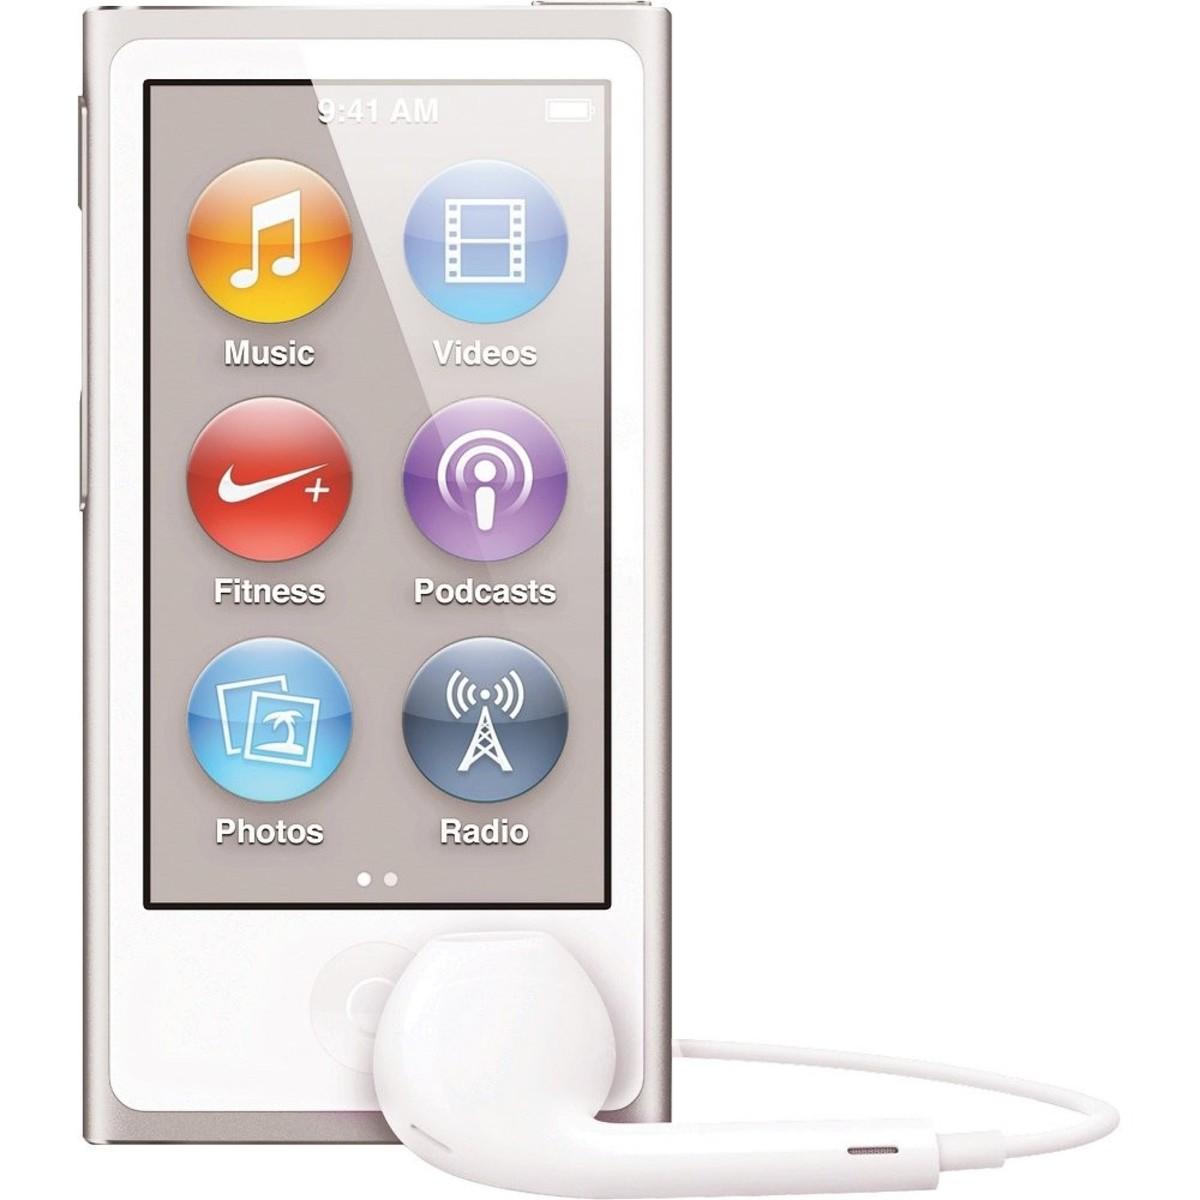 Buy Apple Ipod MP4 Player Nano16GB - MP4 Players - Lulu